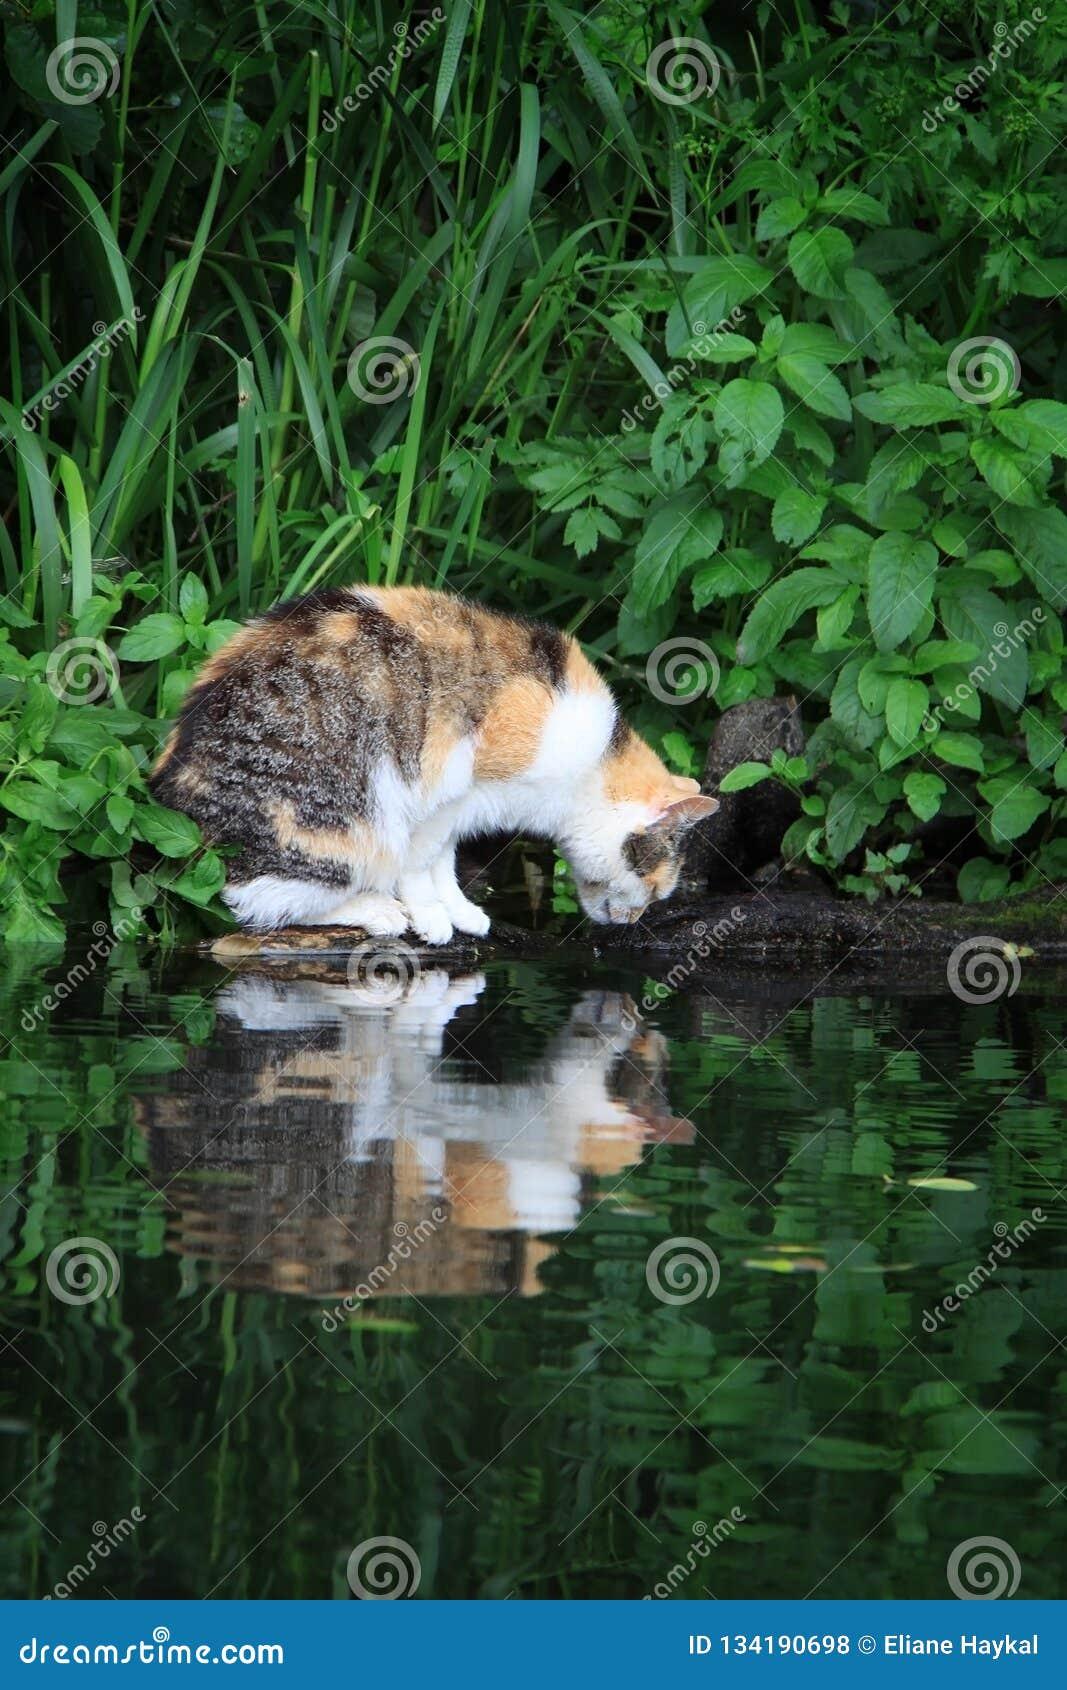 Cat Gazing in Water